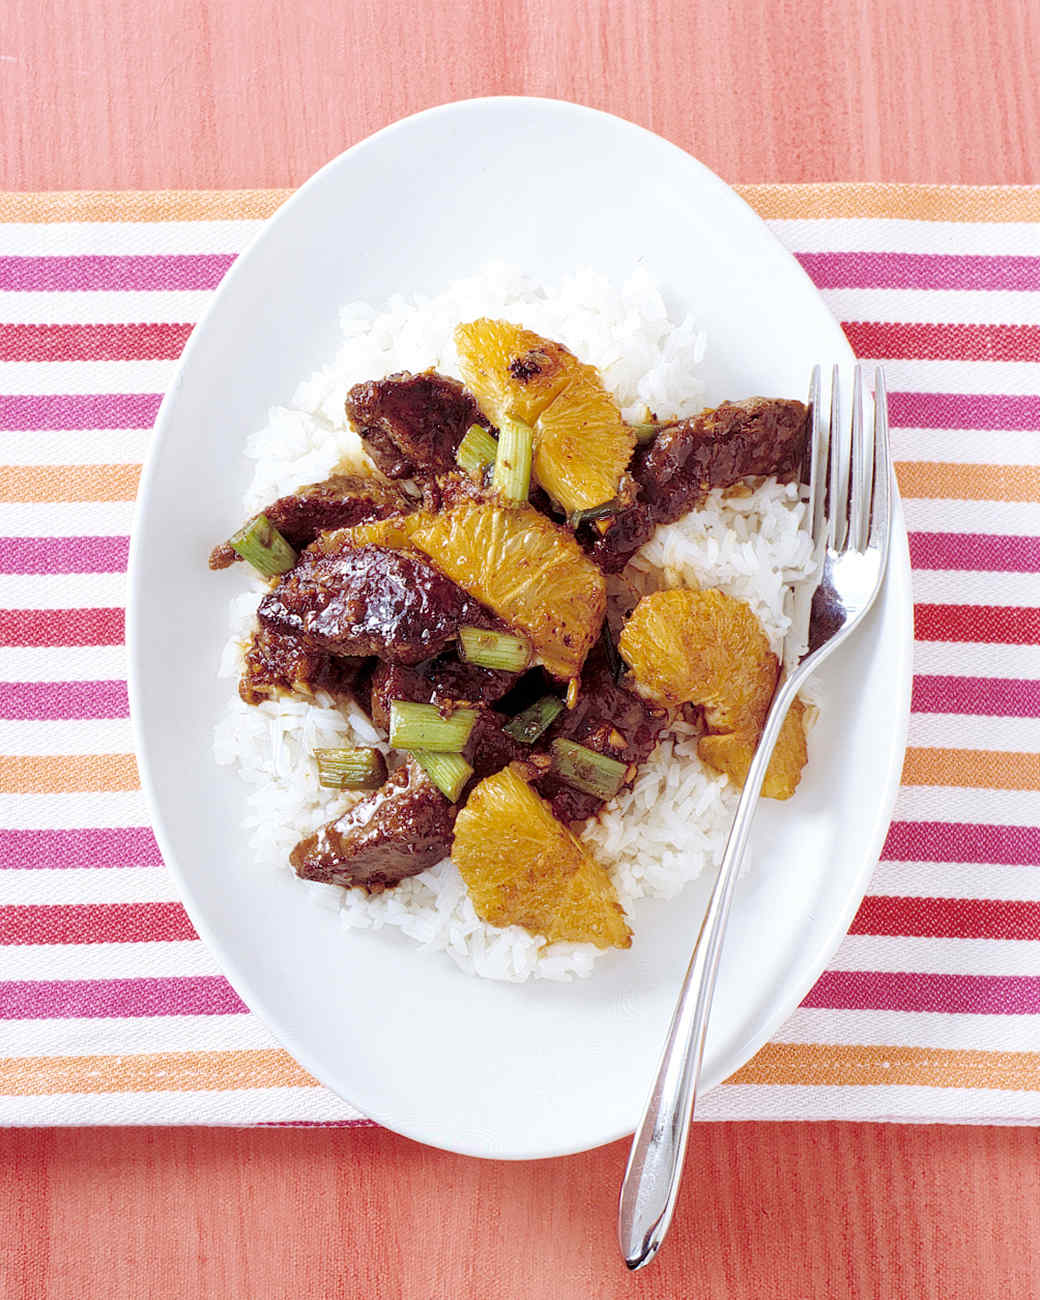 Beef and Orange Stir-Fry